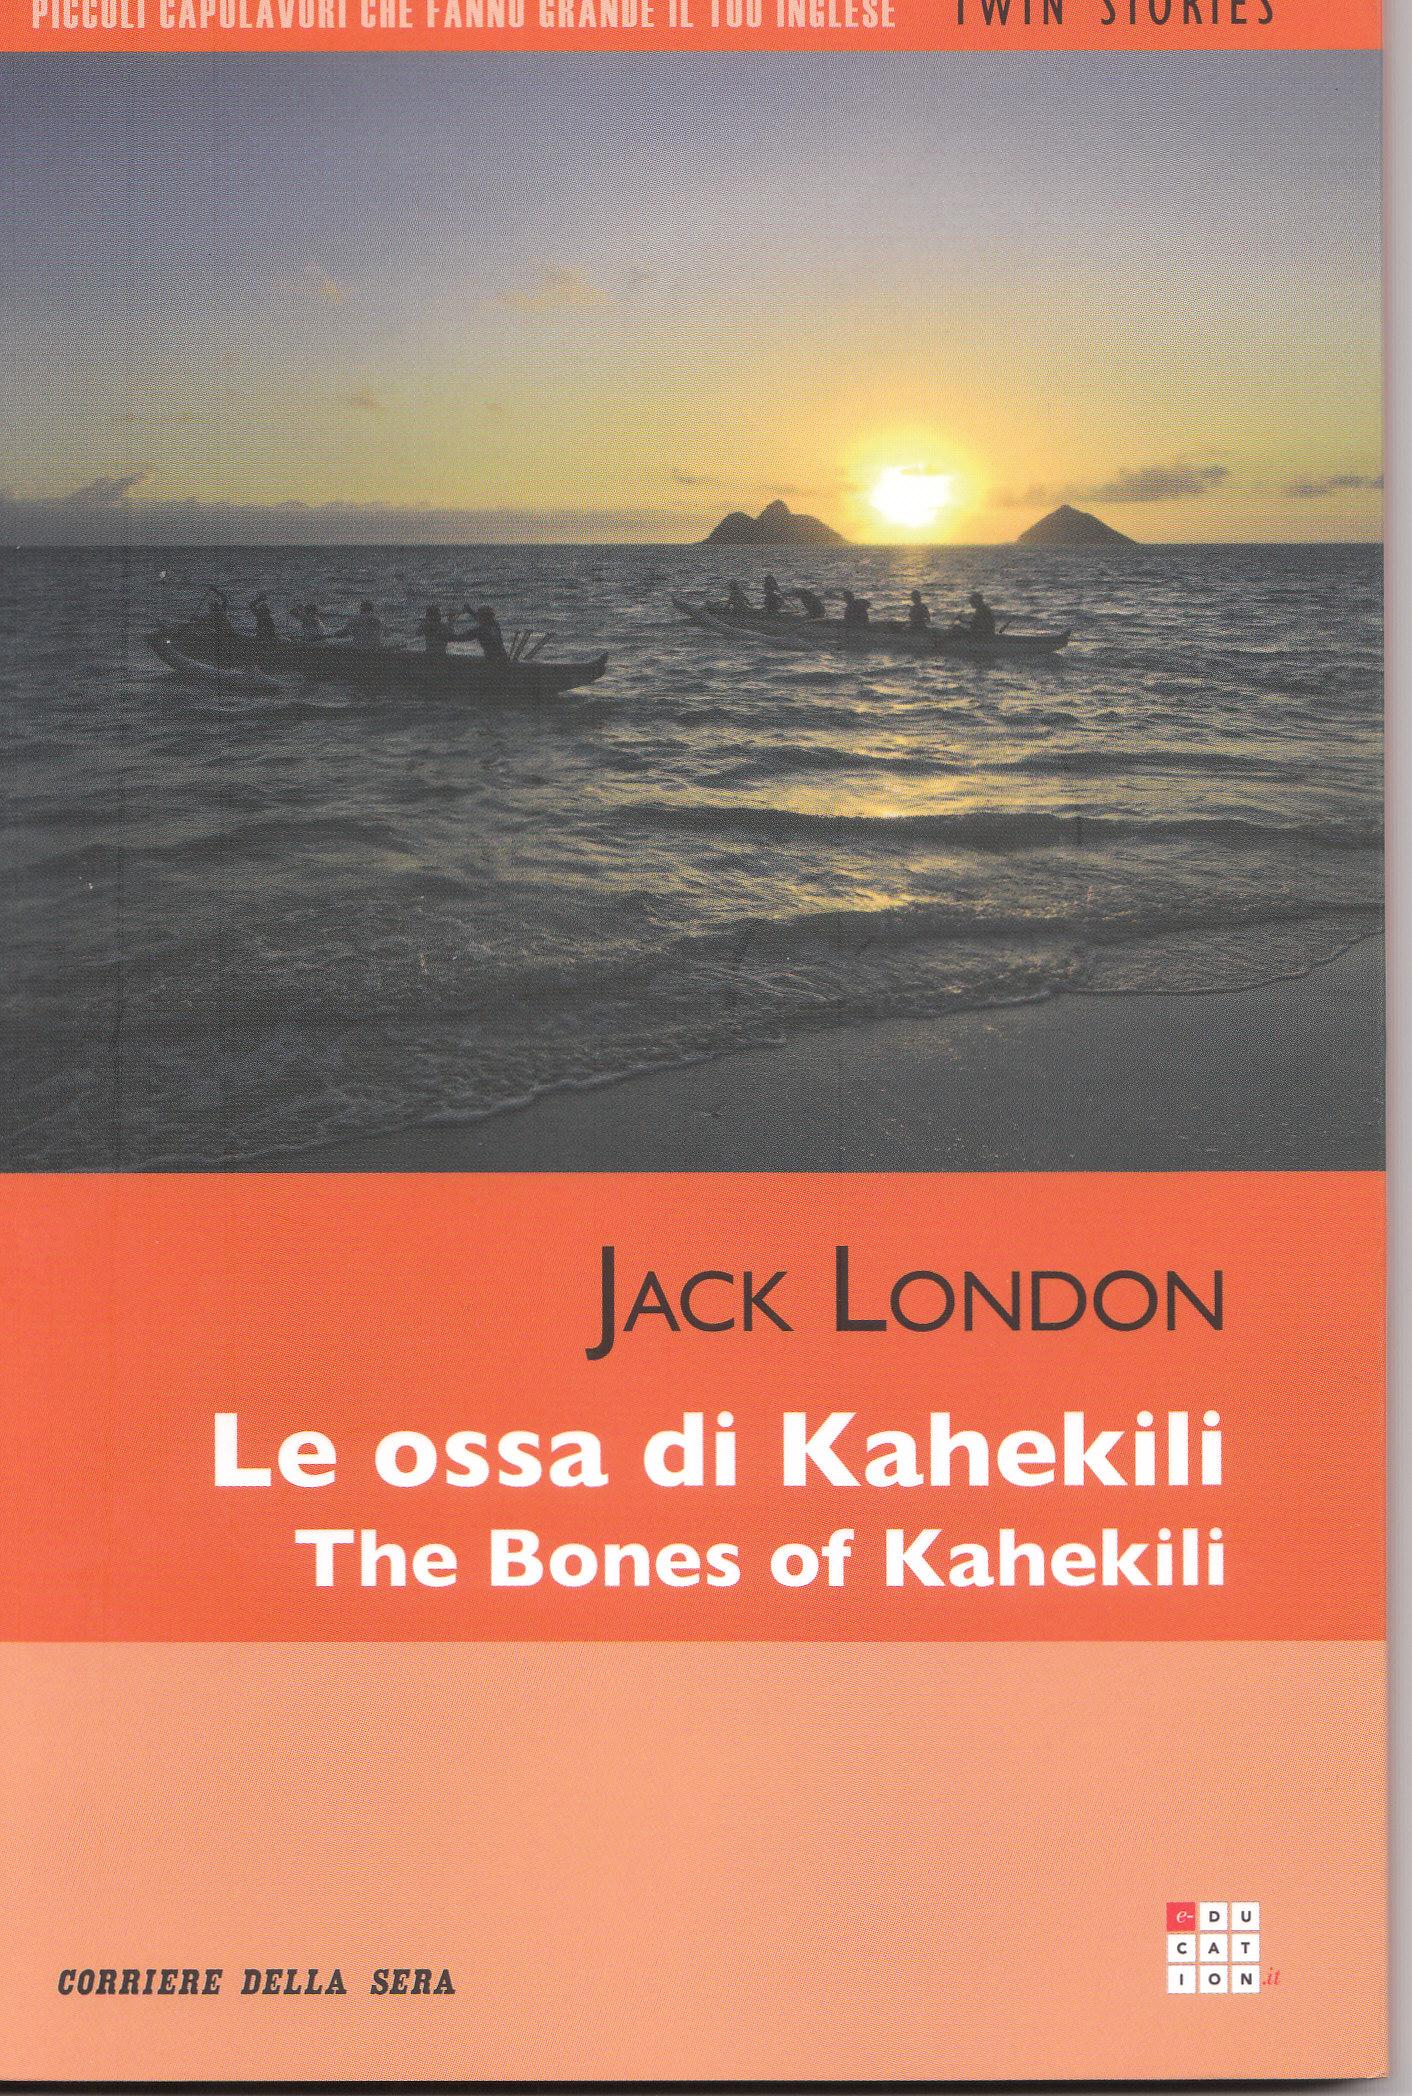 Le ossa di Kahekili/The Bones of Kahekili